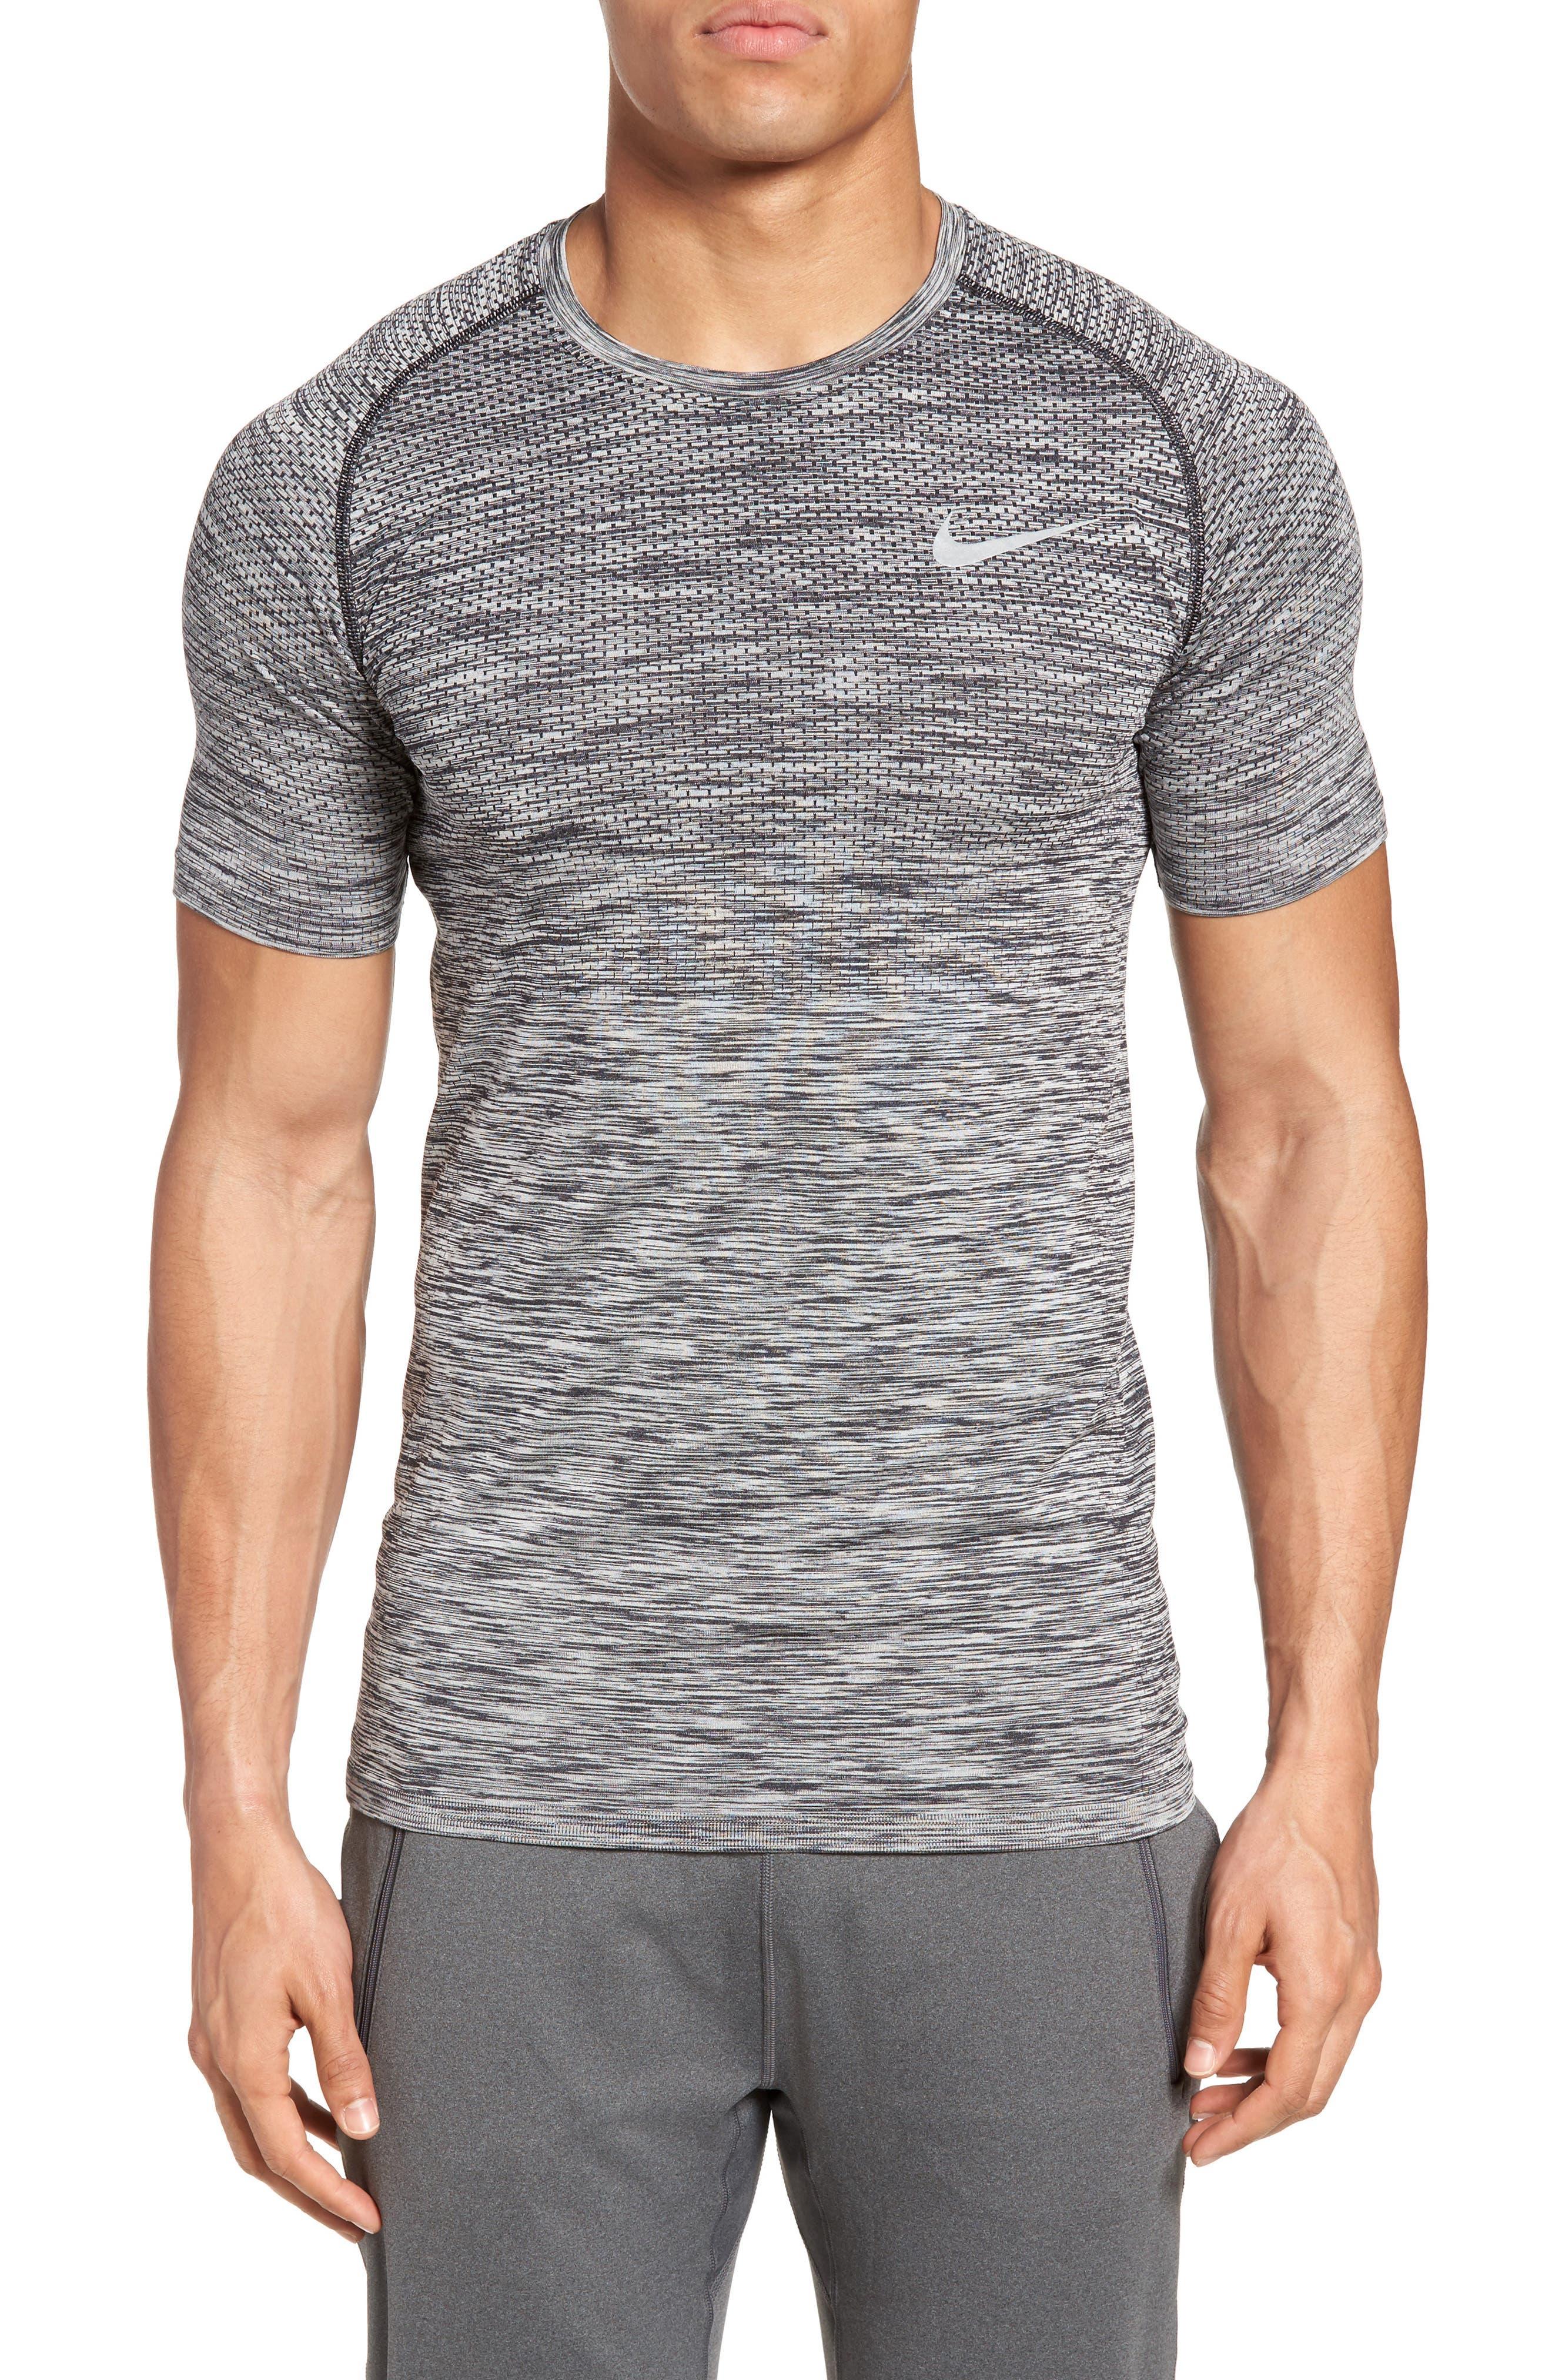 Nike Men Dry Knit Running T-Shirt